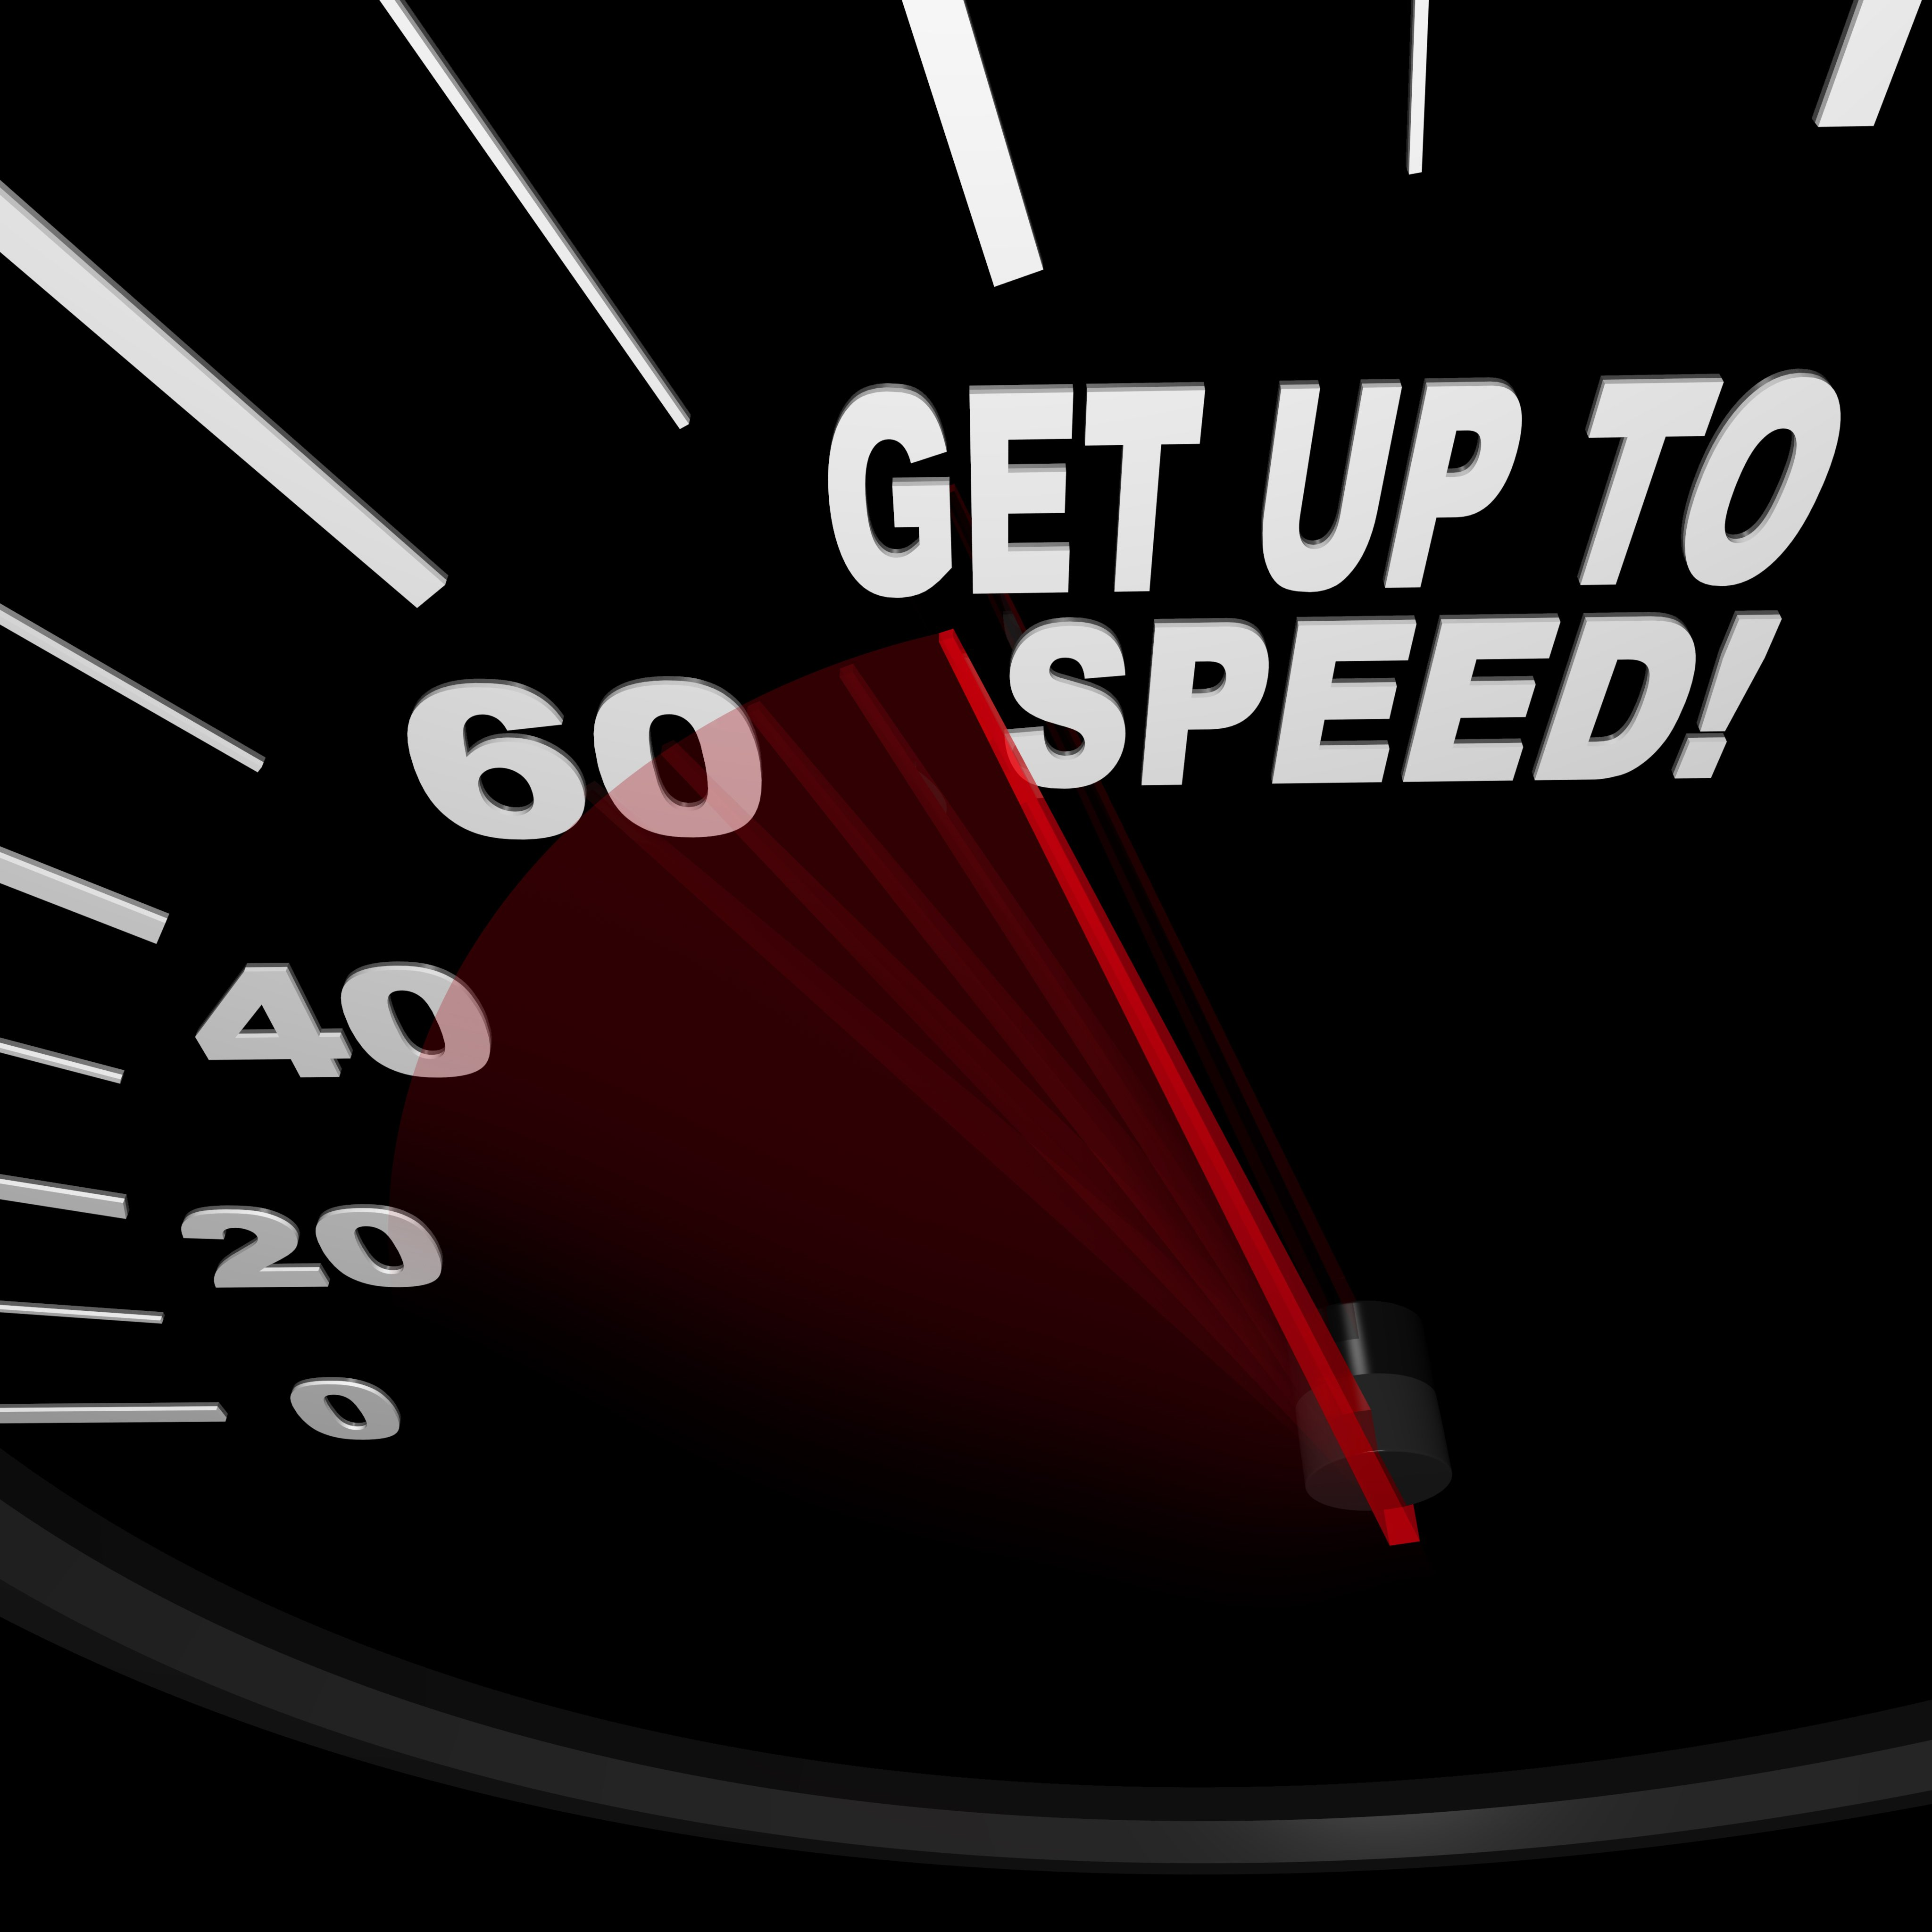 Get Up to Speed - Speedometer